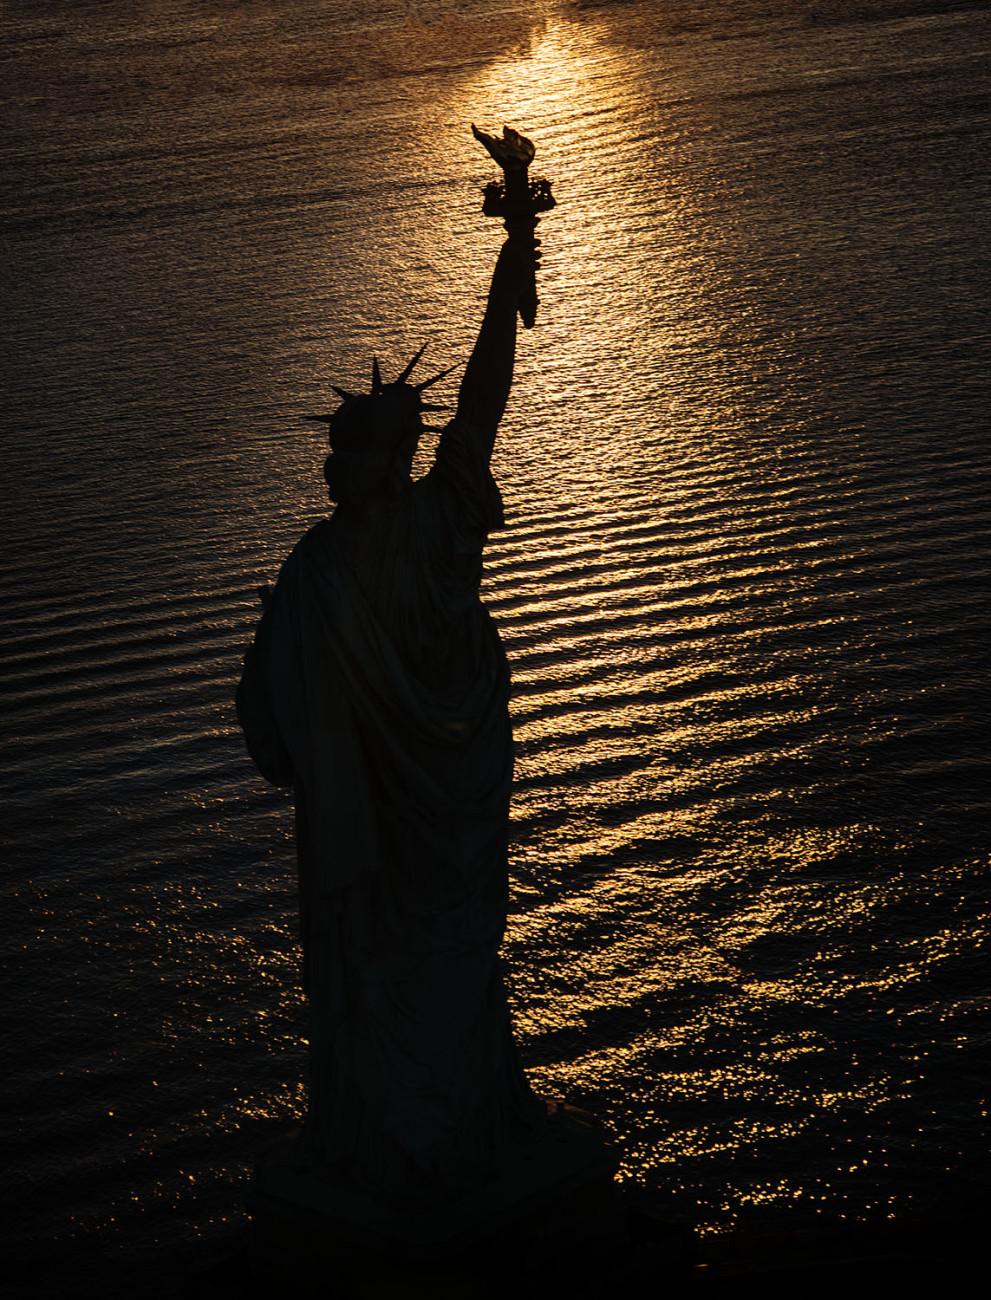 Dawn reflections Statue of Liberty, NY, 2016